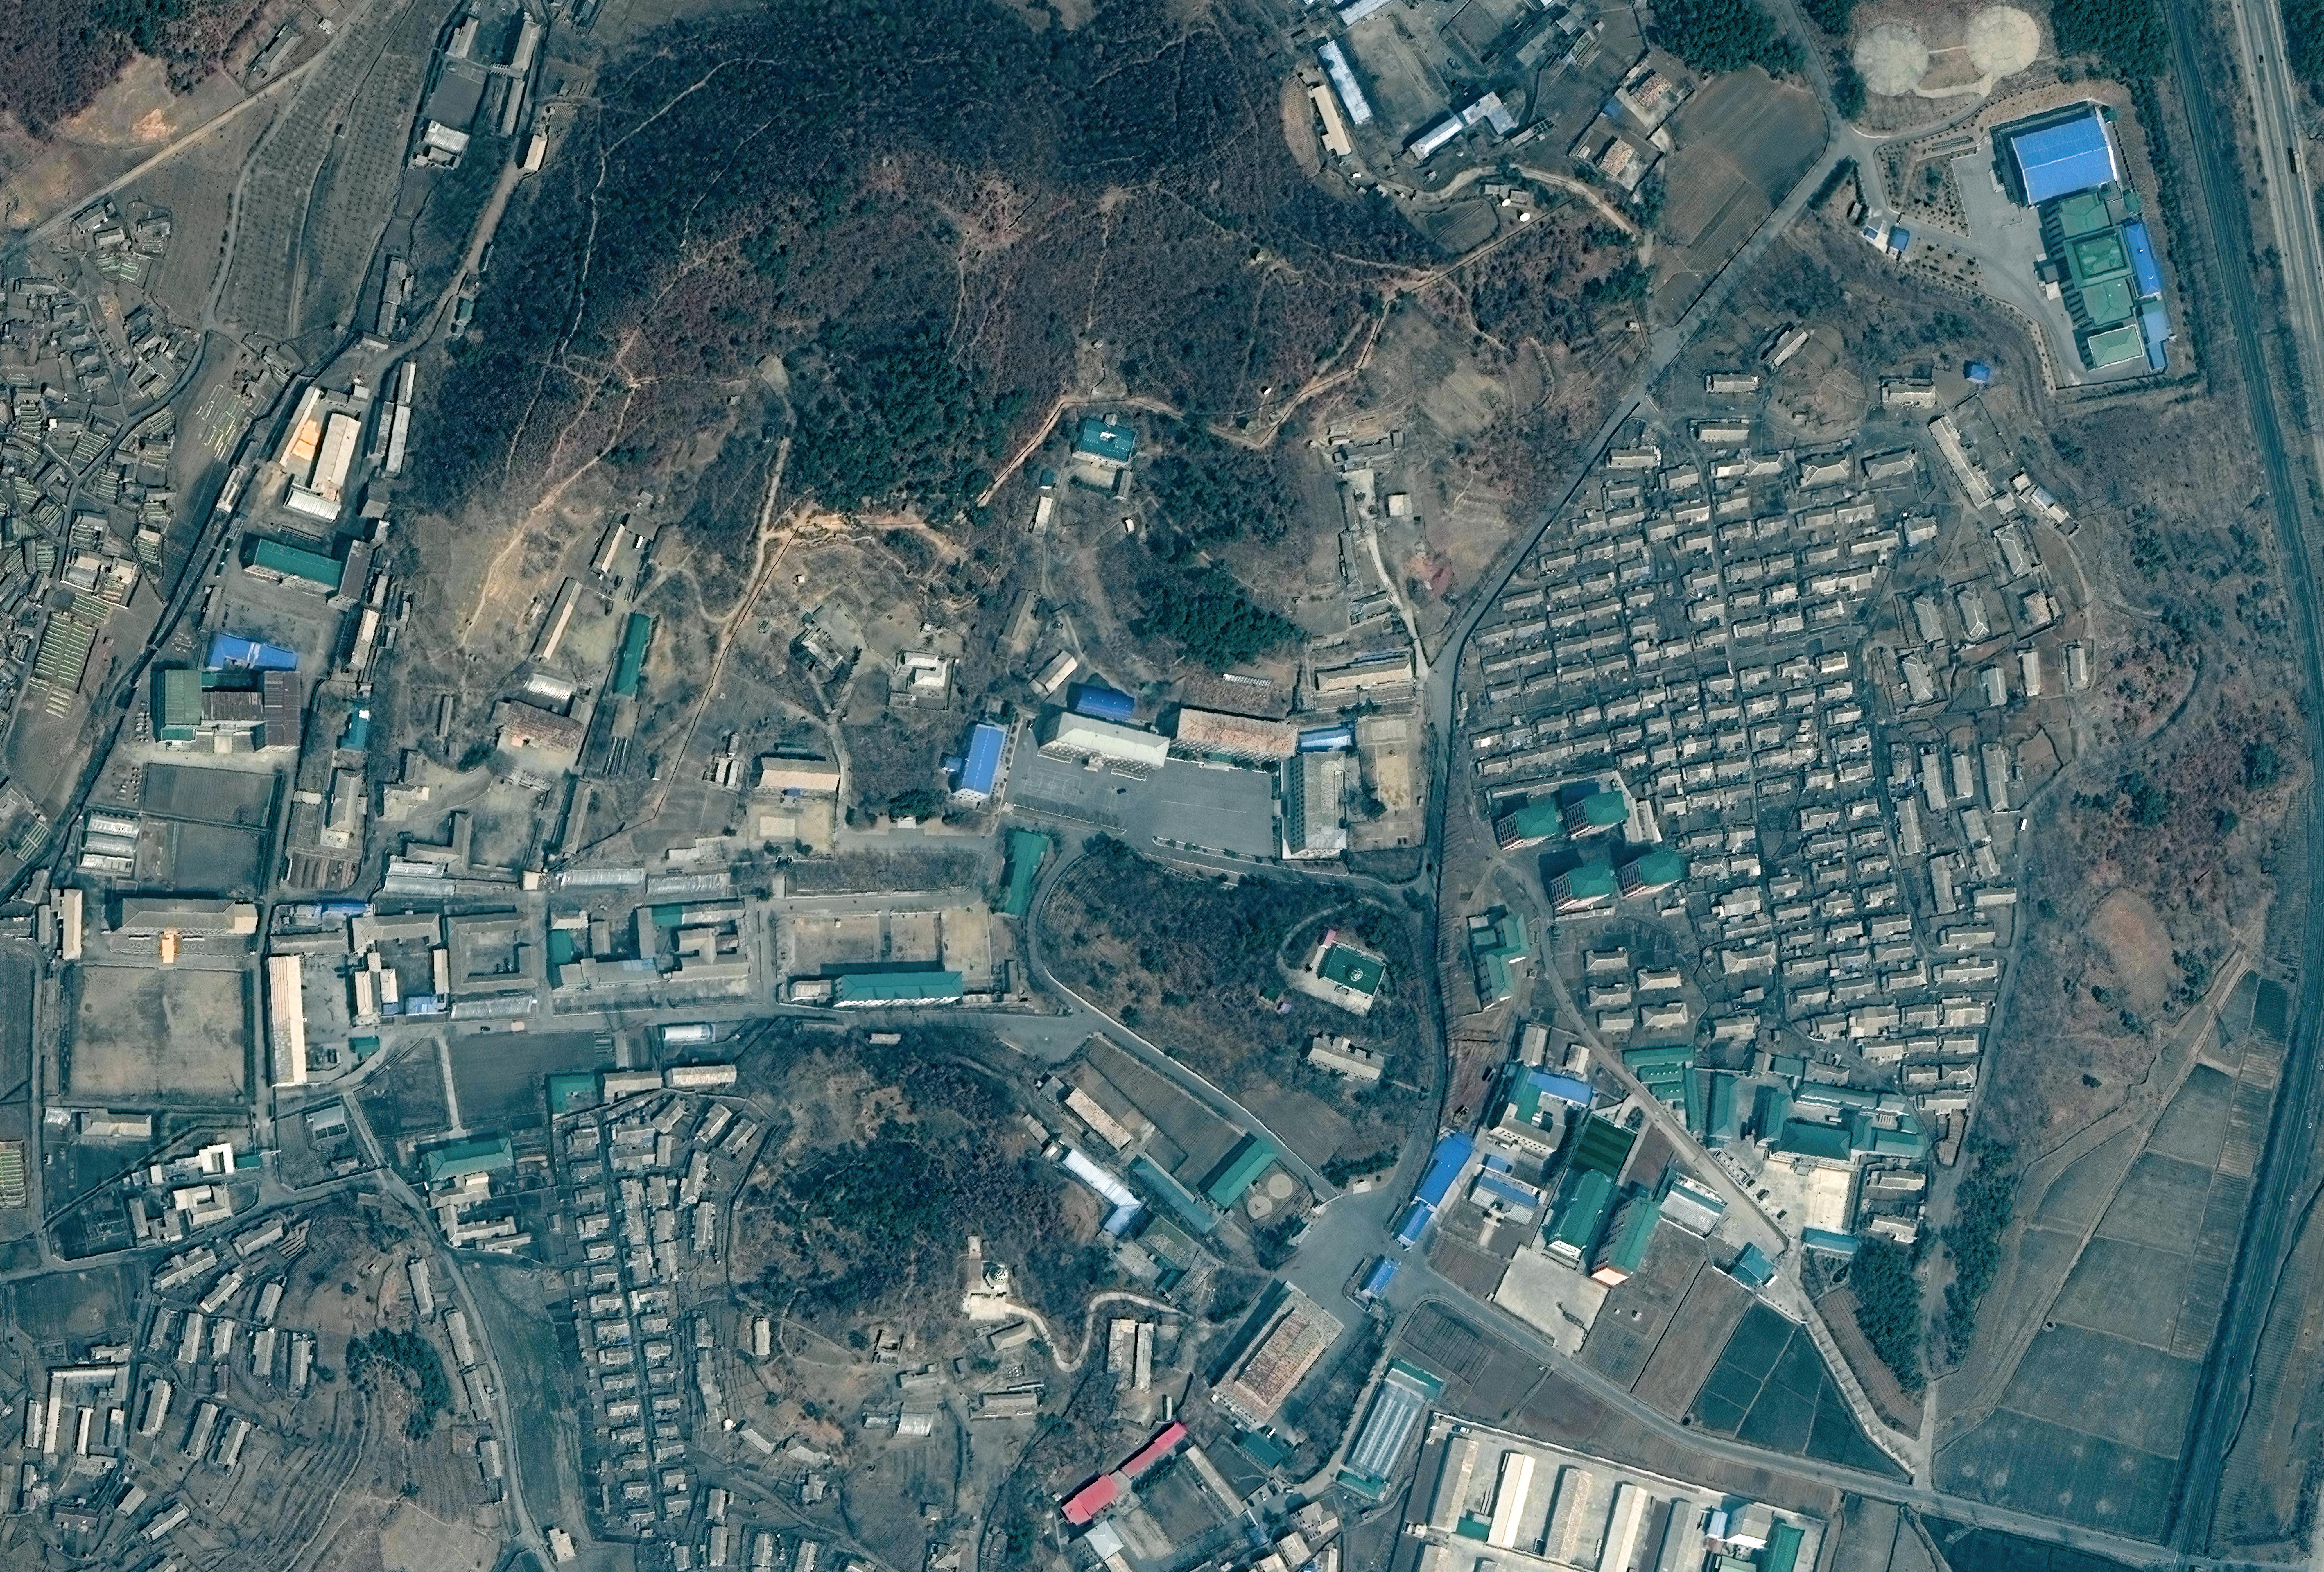 RECONNAISSANCE GENERAL BUREAU HEADQUARTERS, NORTH KOREA — MARCH 21, 2020: Maxar closeup satellite imagery of the former location of the Reconnaissance General Bureau Headquarters.